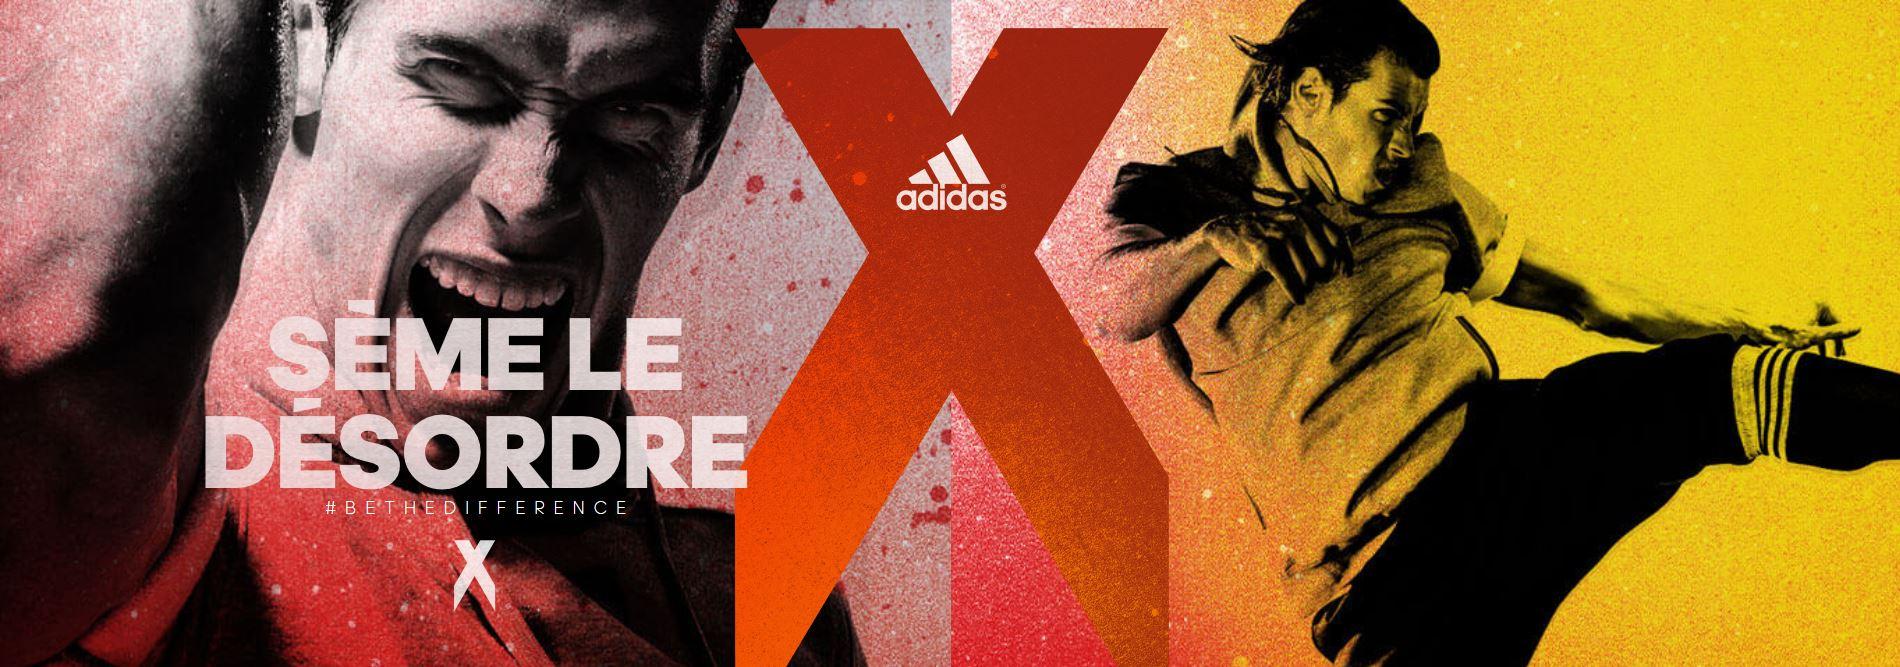 2015-06-08 11_55_42-Chaussure de football adidas X15 _ Crée le chaos